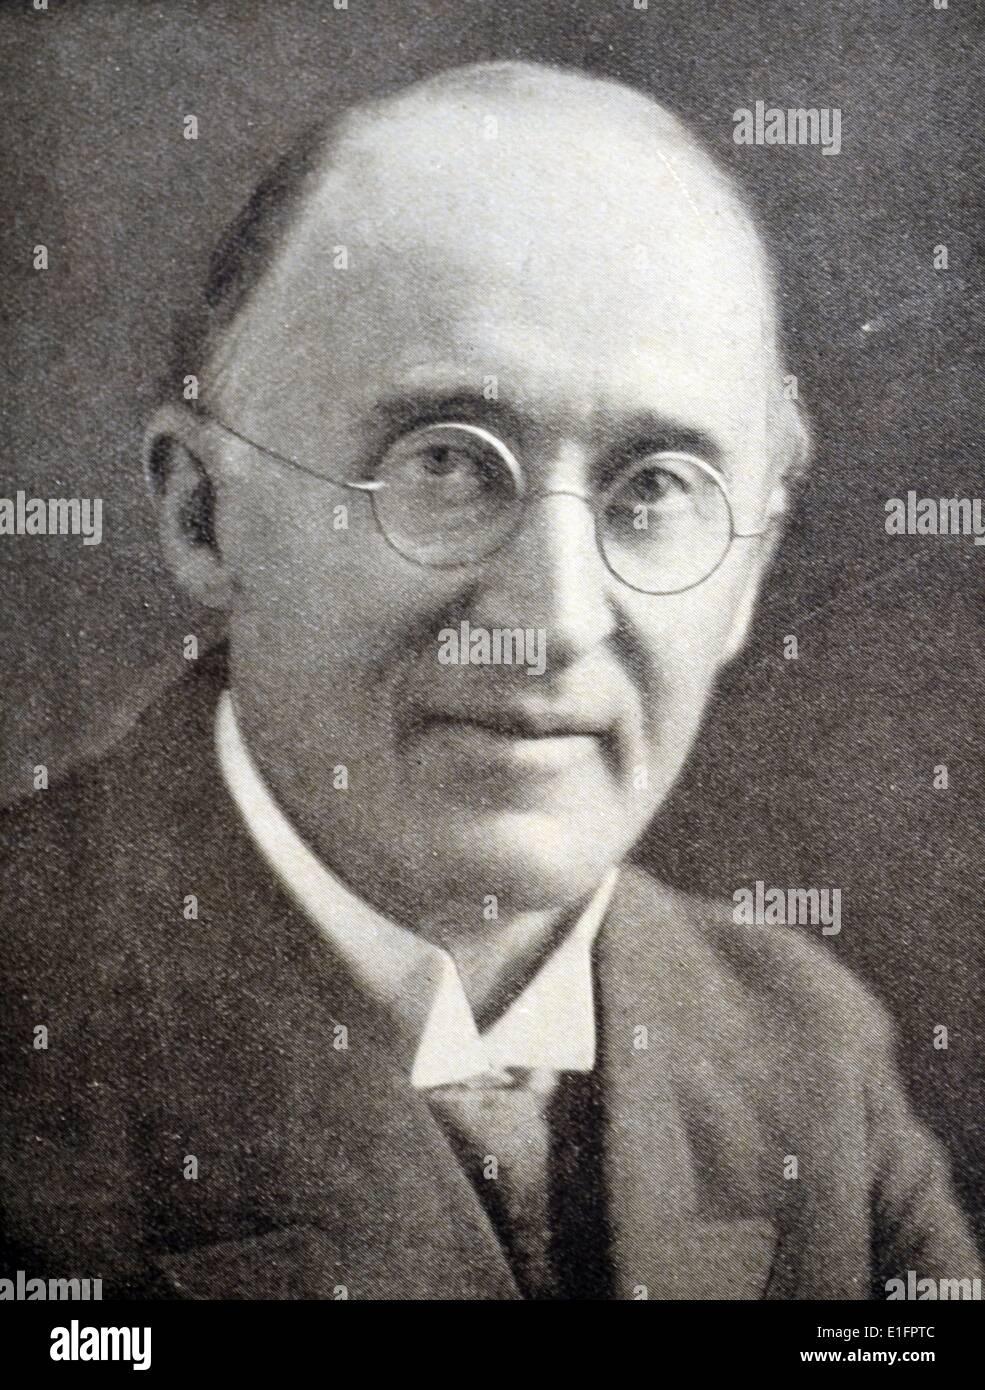 Photograpgh of Frederick Theodore Albert Delius - Stock Image